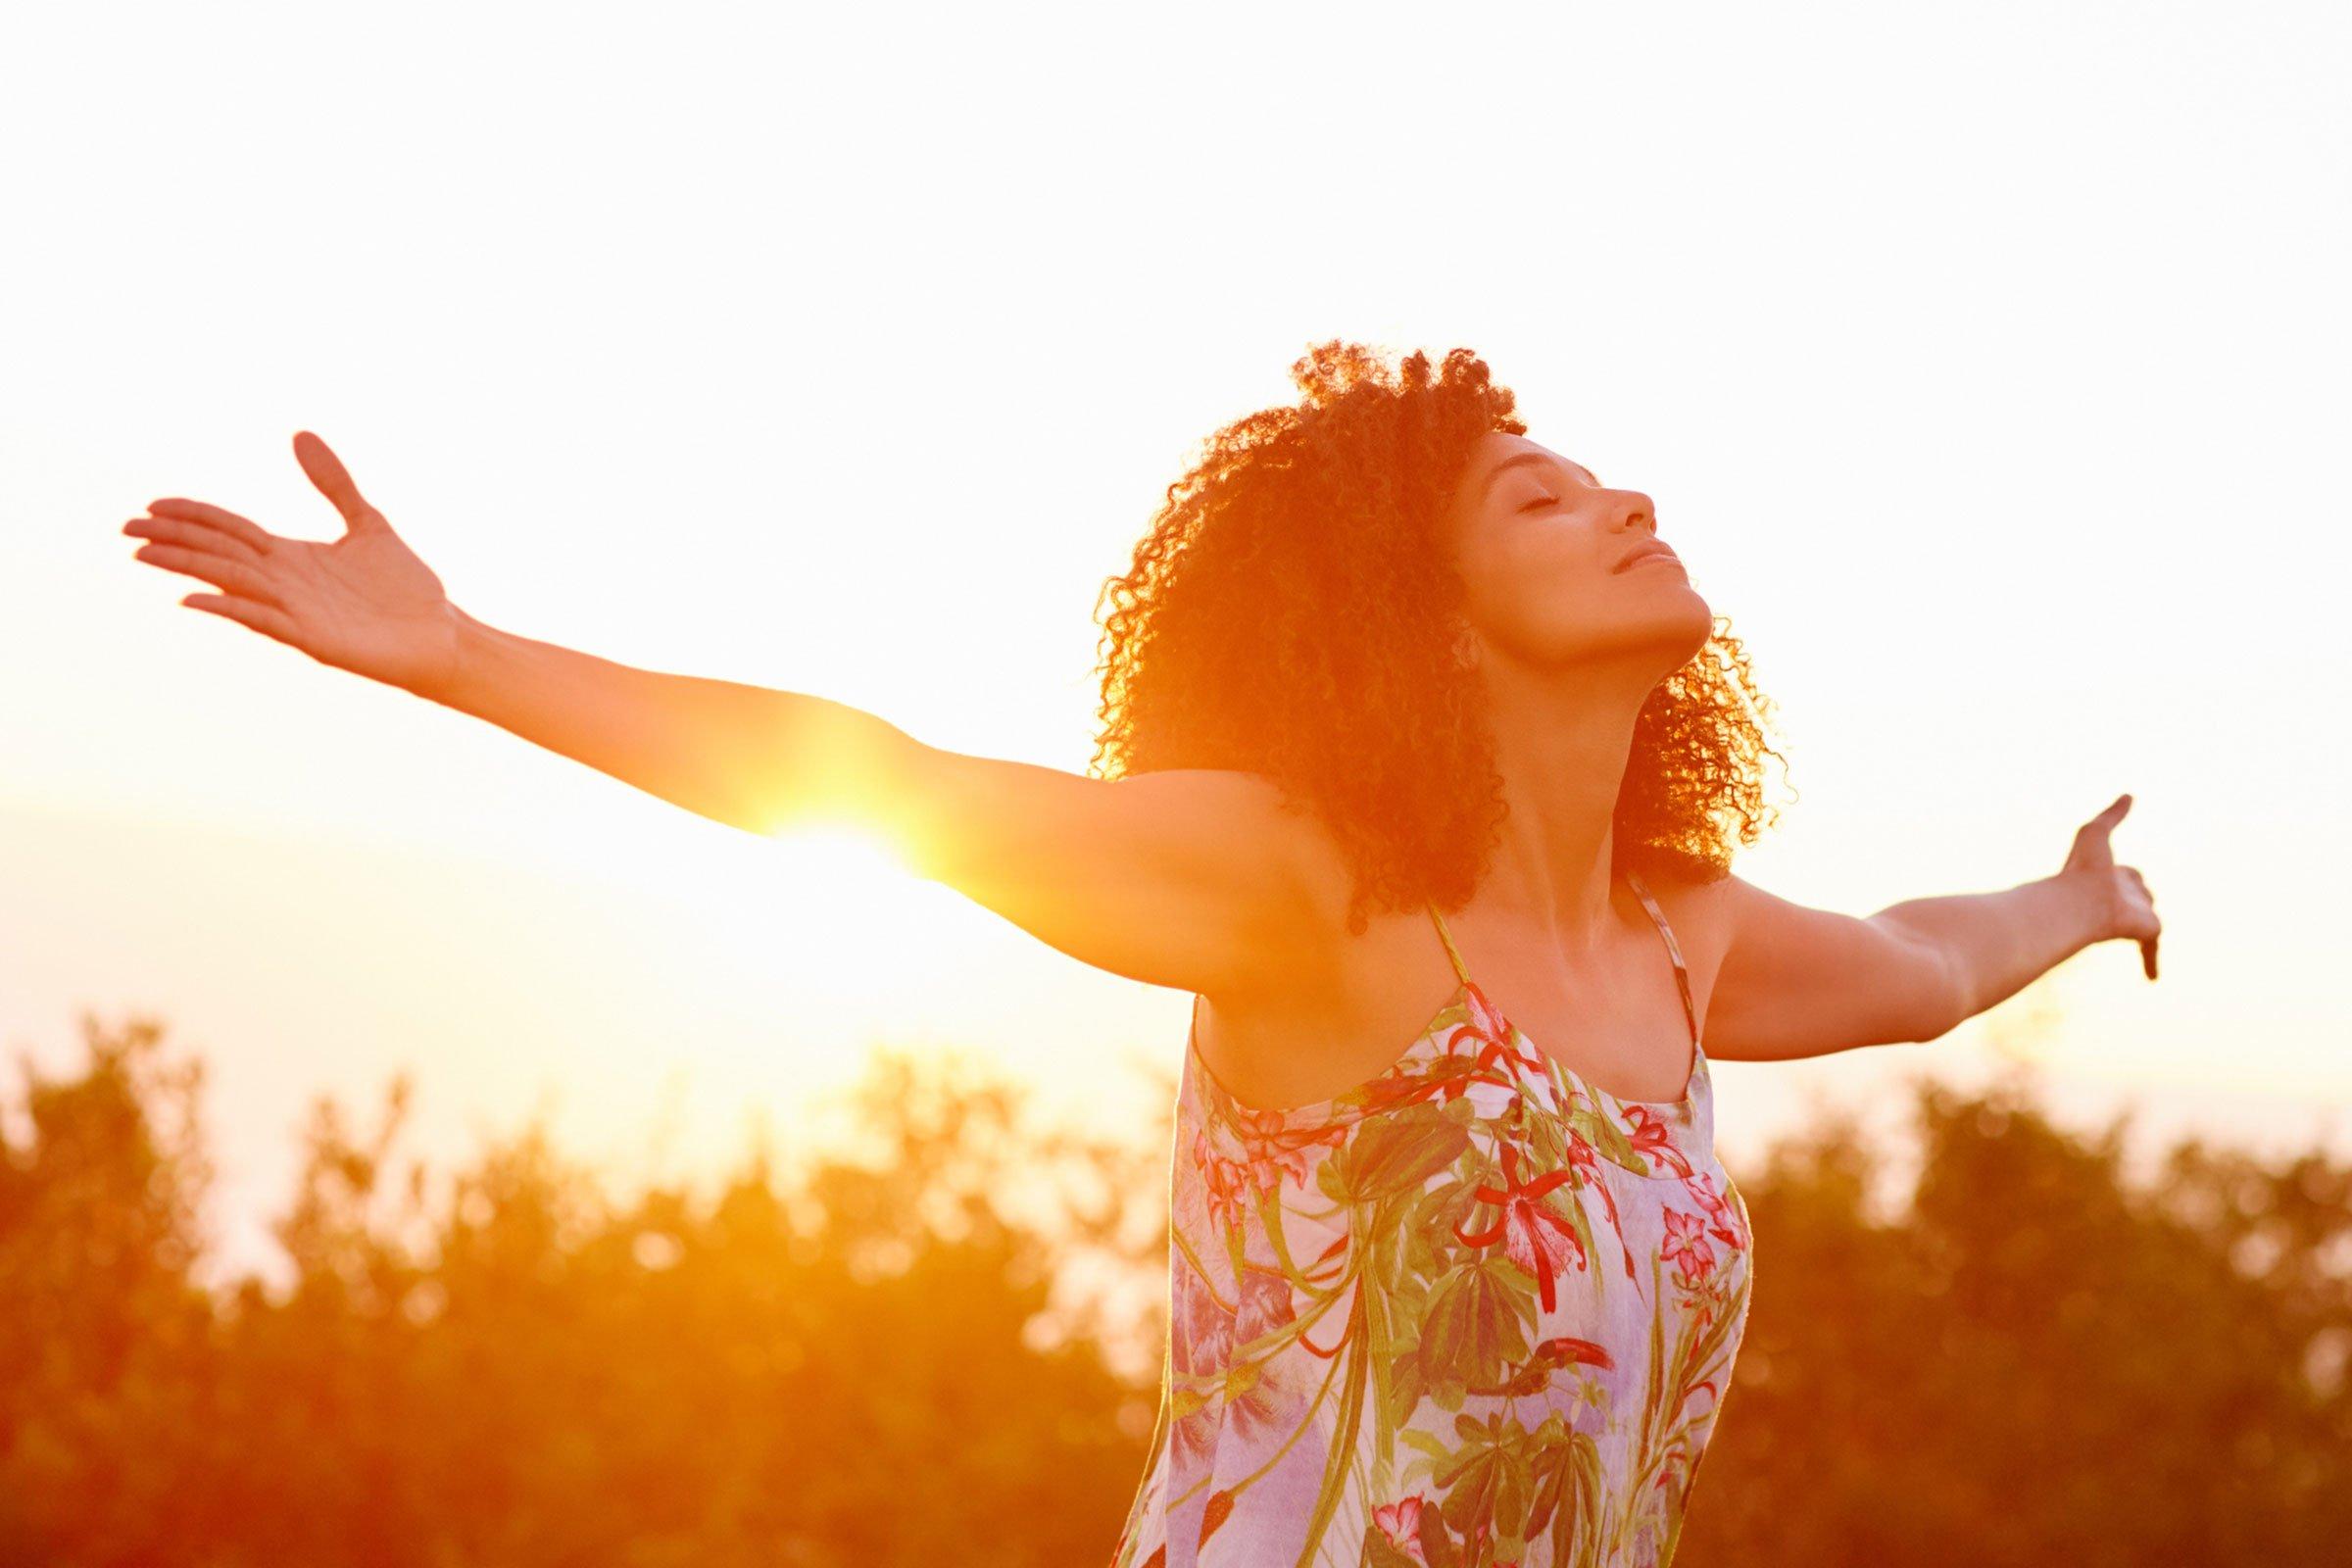 Consumati-vaenergia si timpul pe ceea ce conteaza cel mai mult